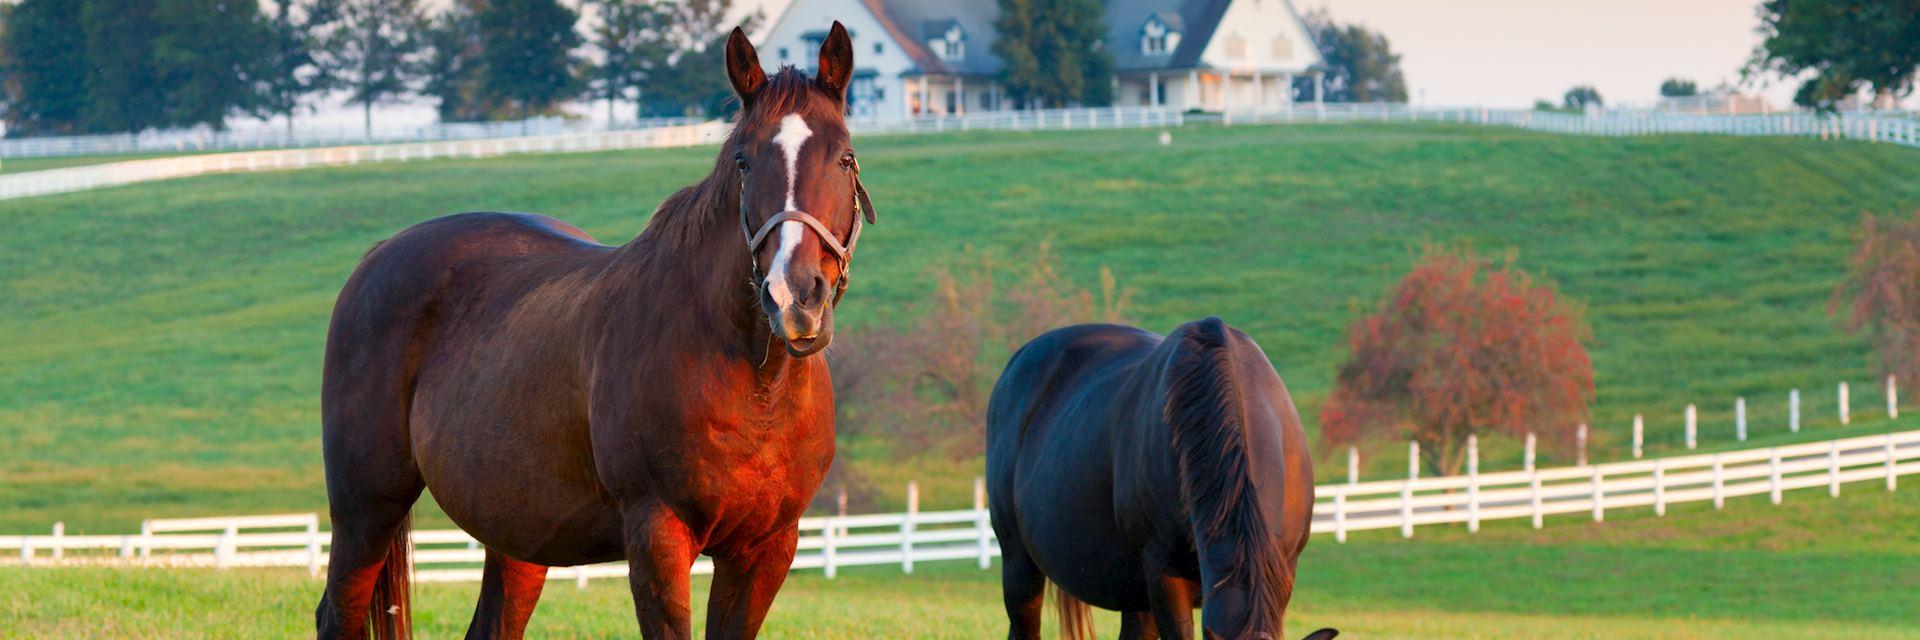 Horses in Lexington, Kentucky